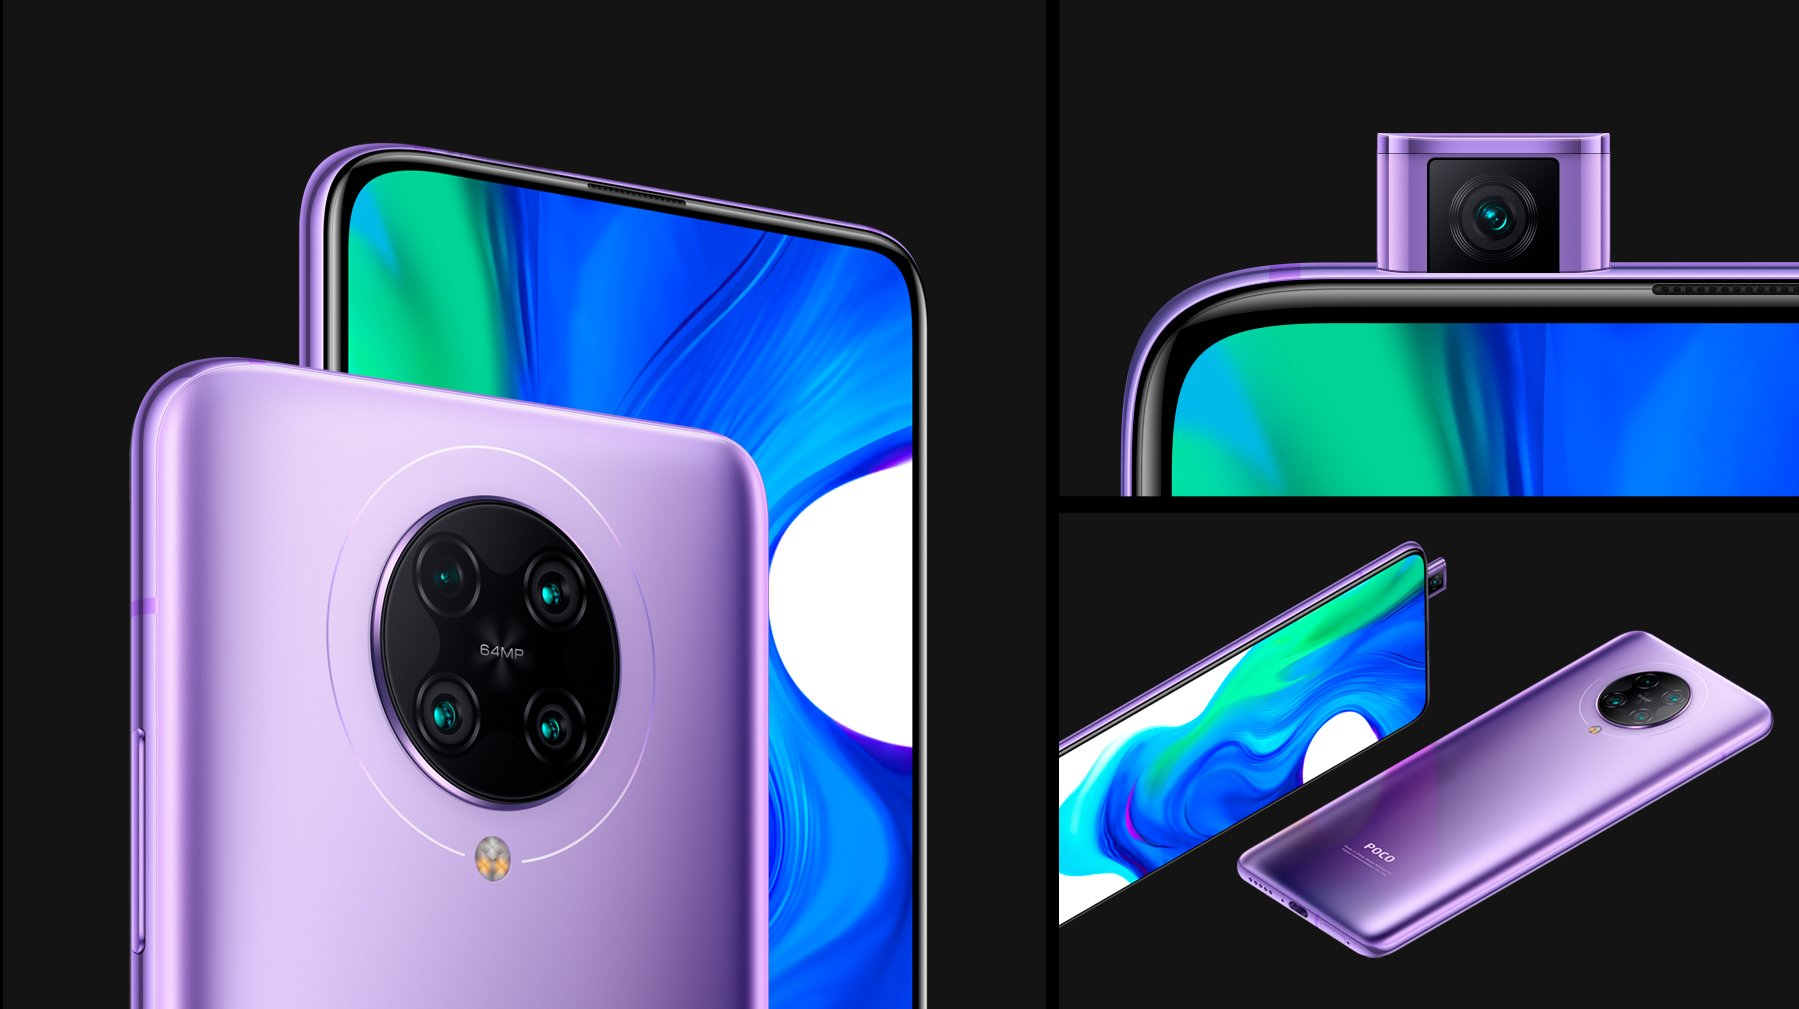 Smartphone Xiaomi Poco F2 Pro - The ultimate 2020 Review - Best price in UAE - Camera - Darahim.net